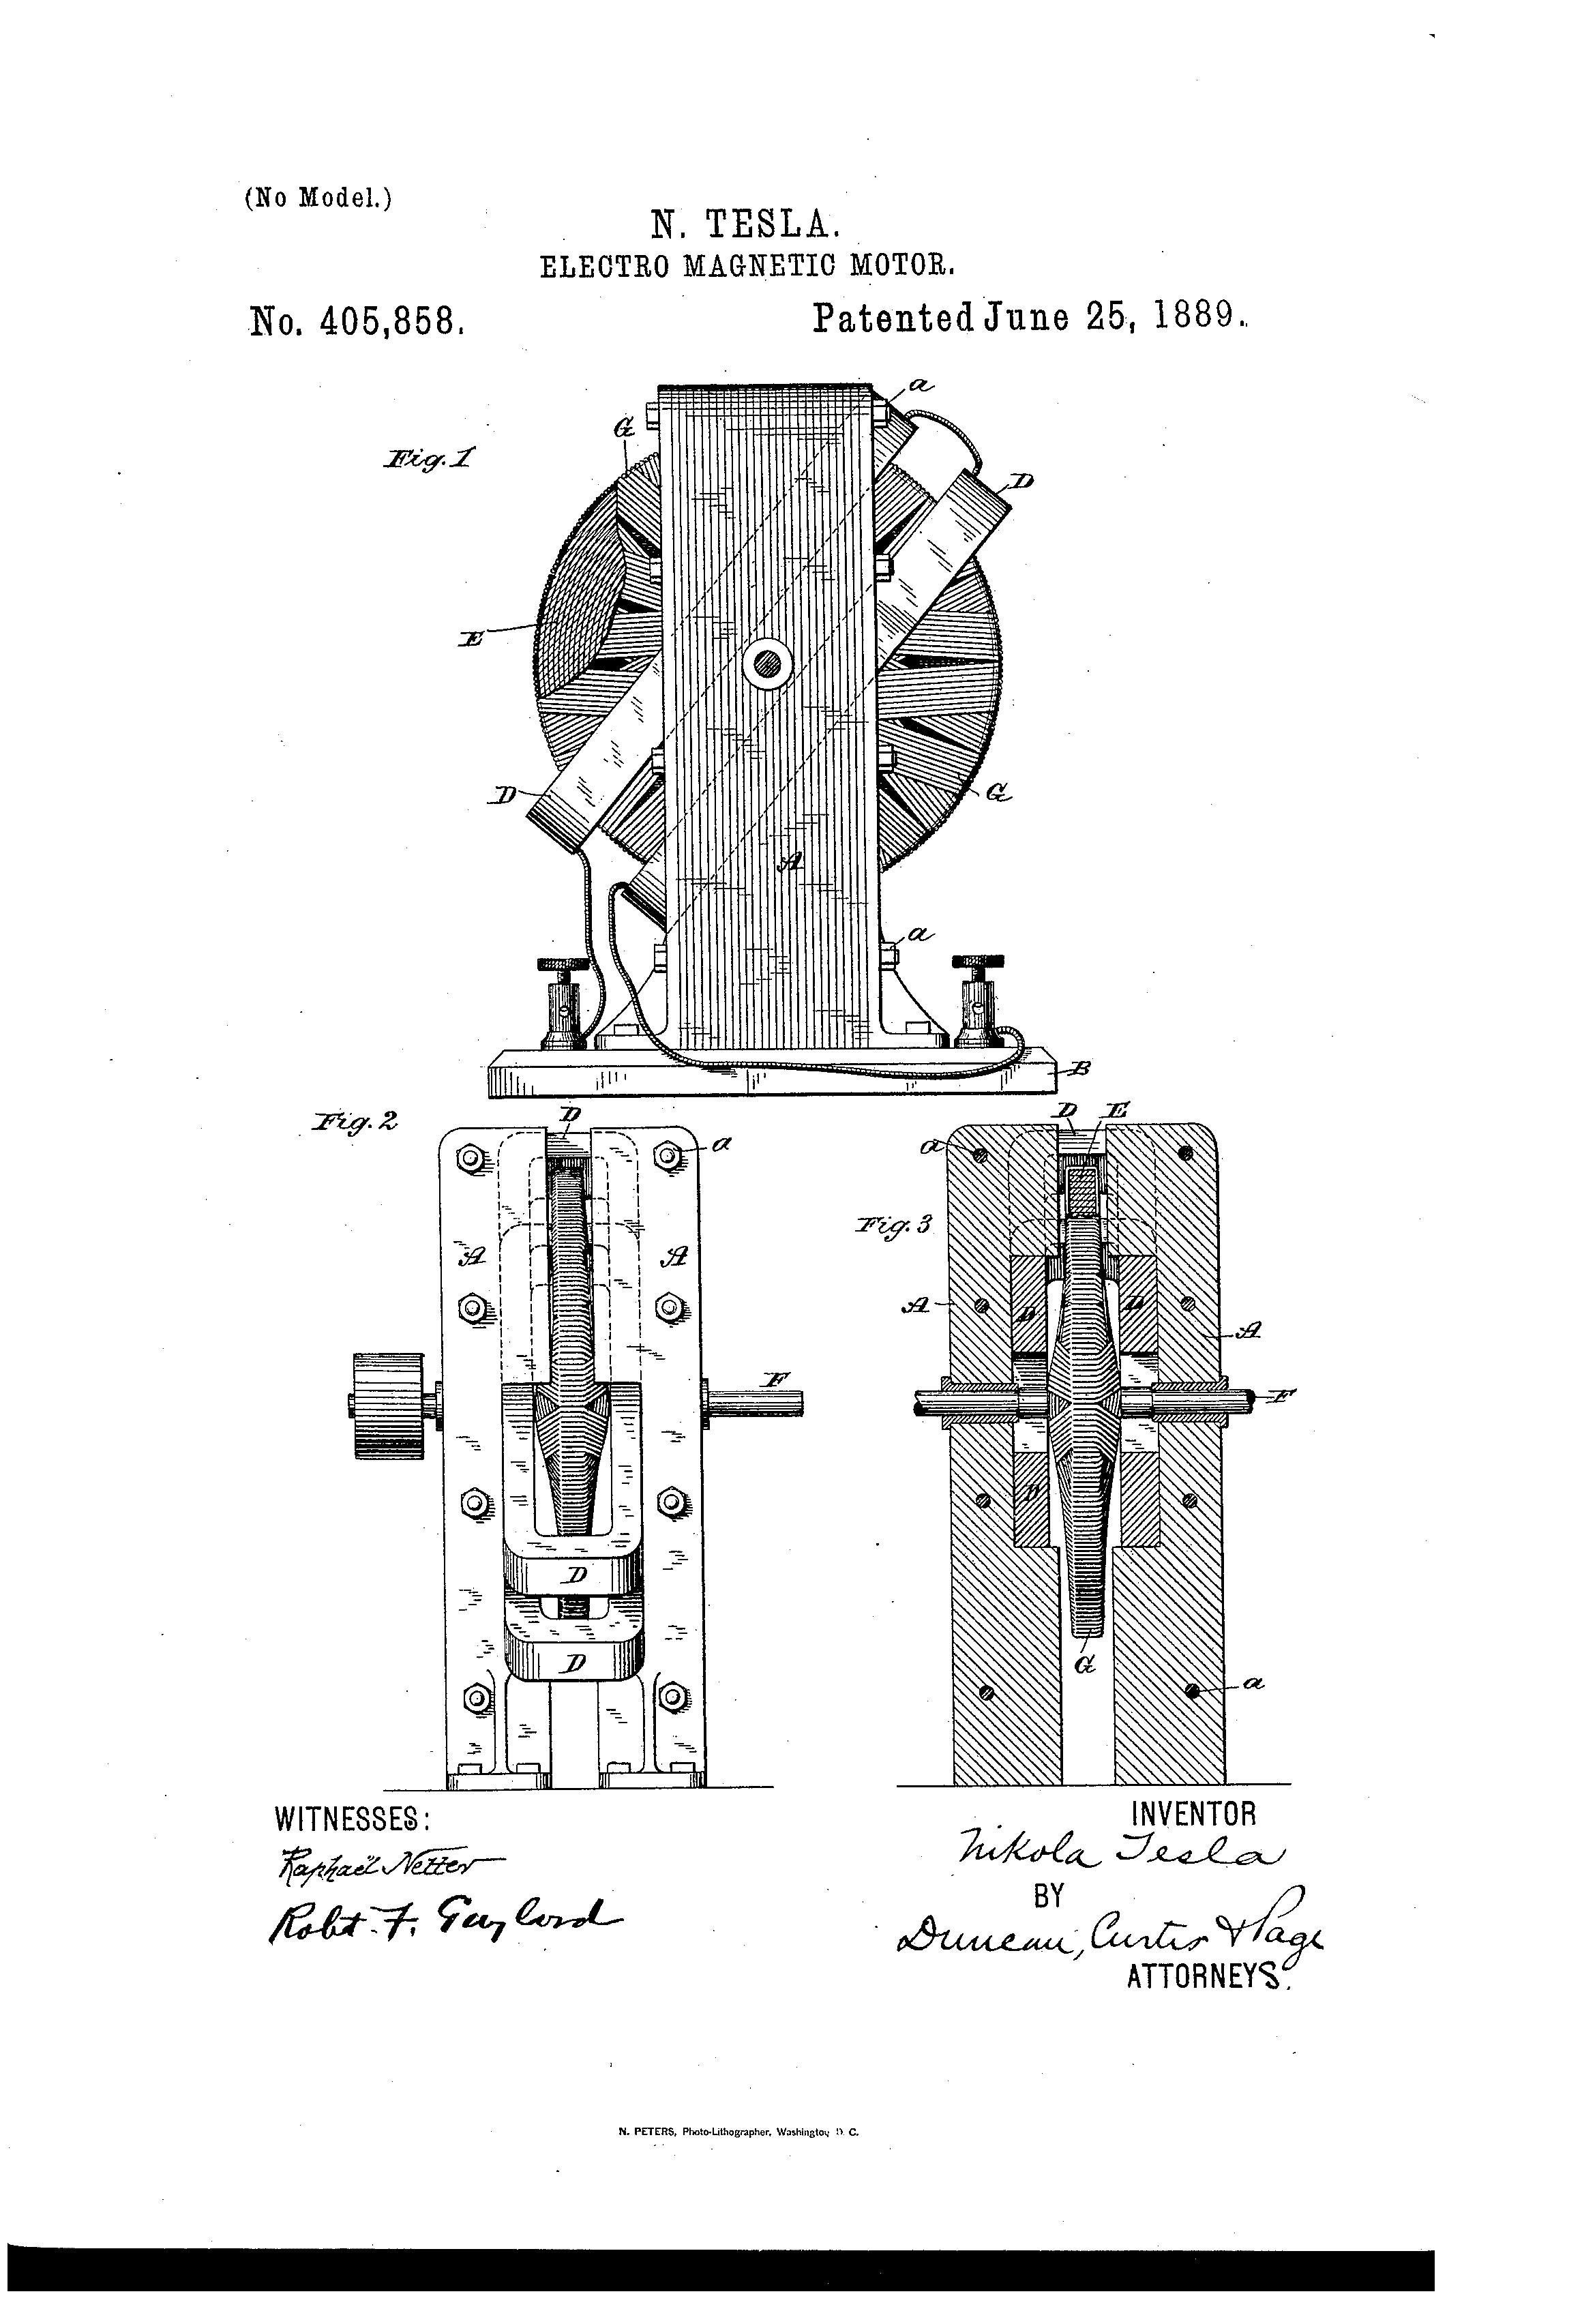 patent us405858 - nikola tesla